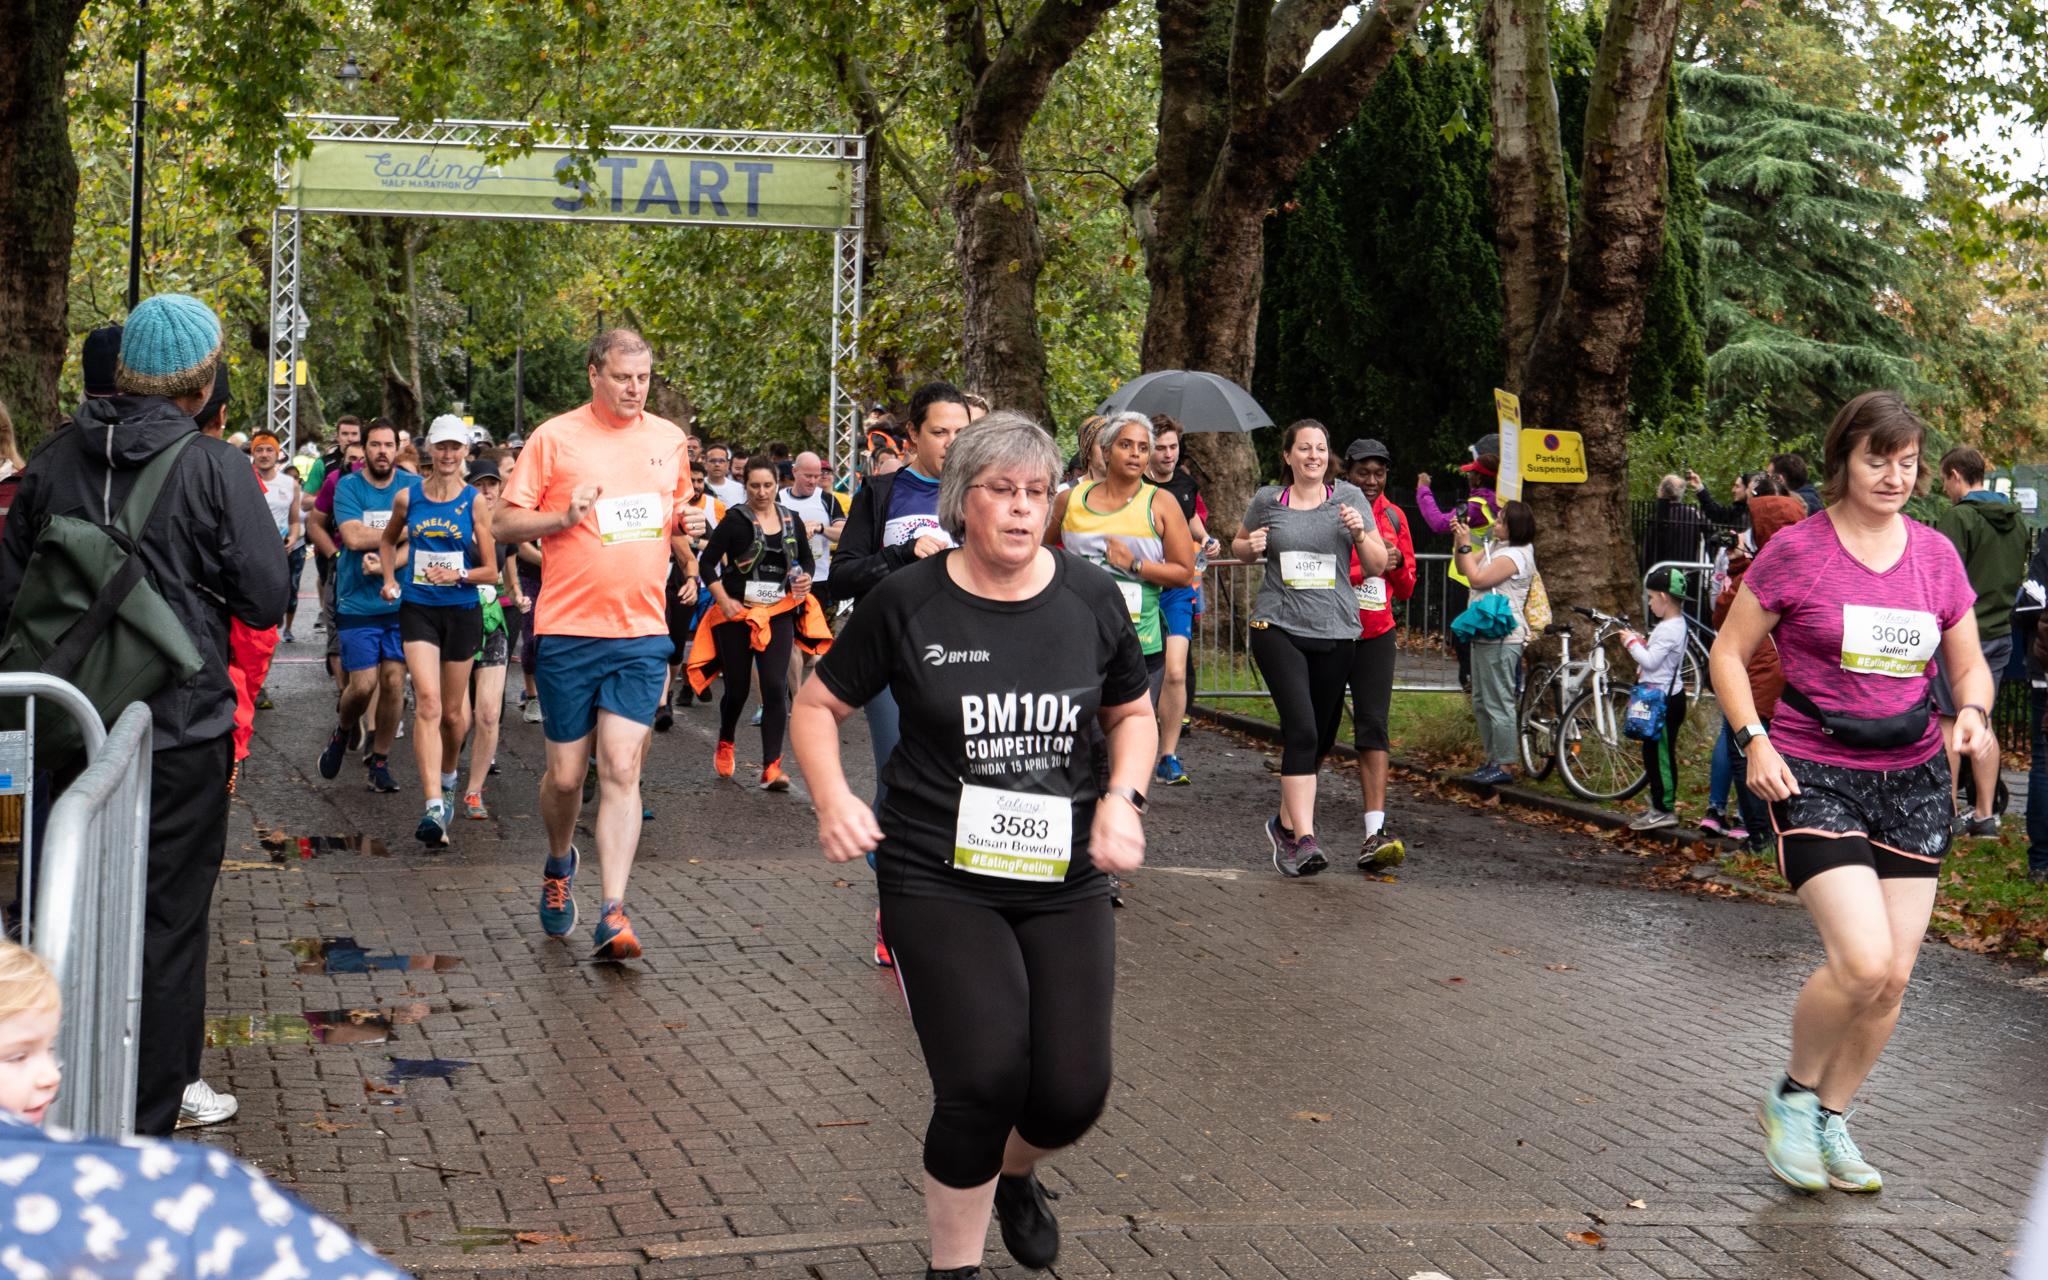 Ealing Half Marathon 2019